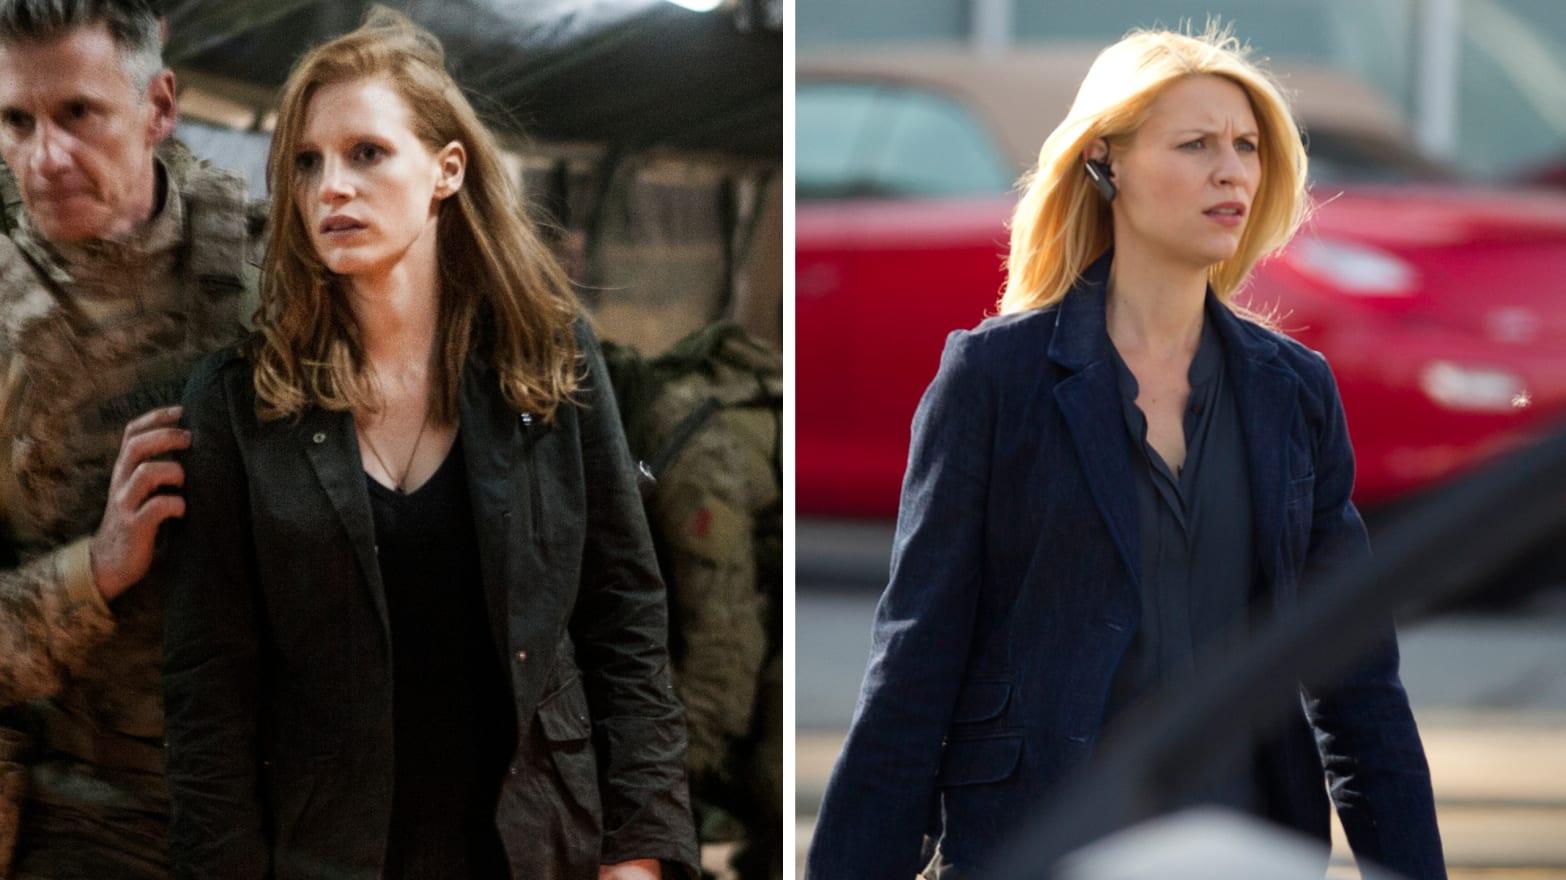 Homeland' and 'Zero Dark Thirty': The Dilemma of the Female Spy